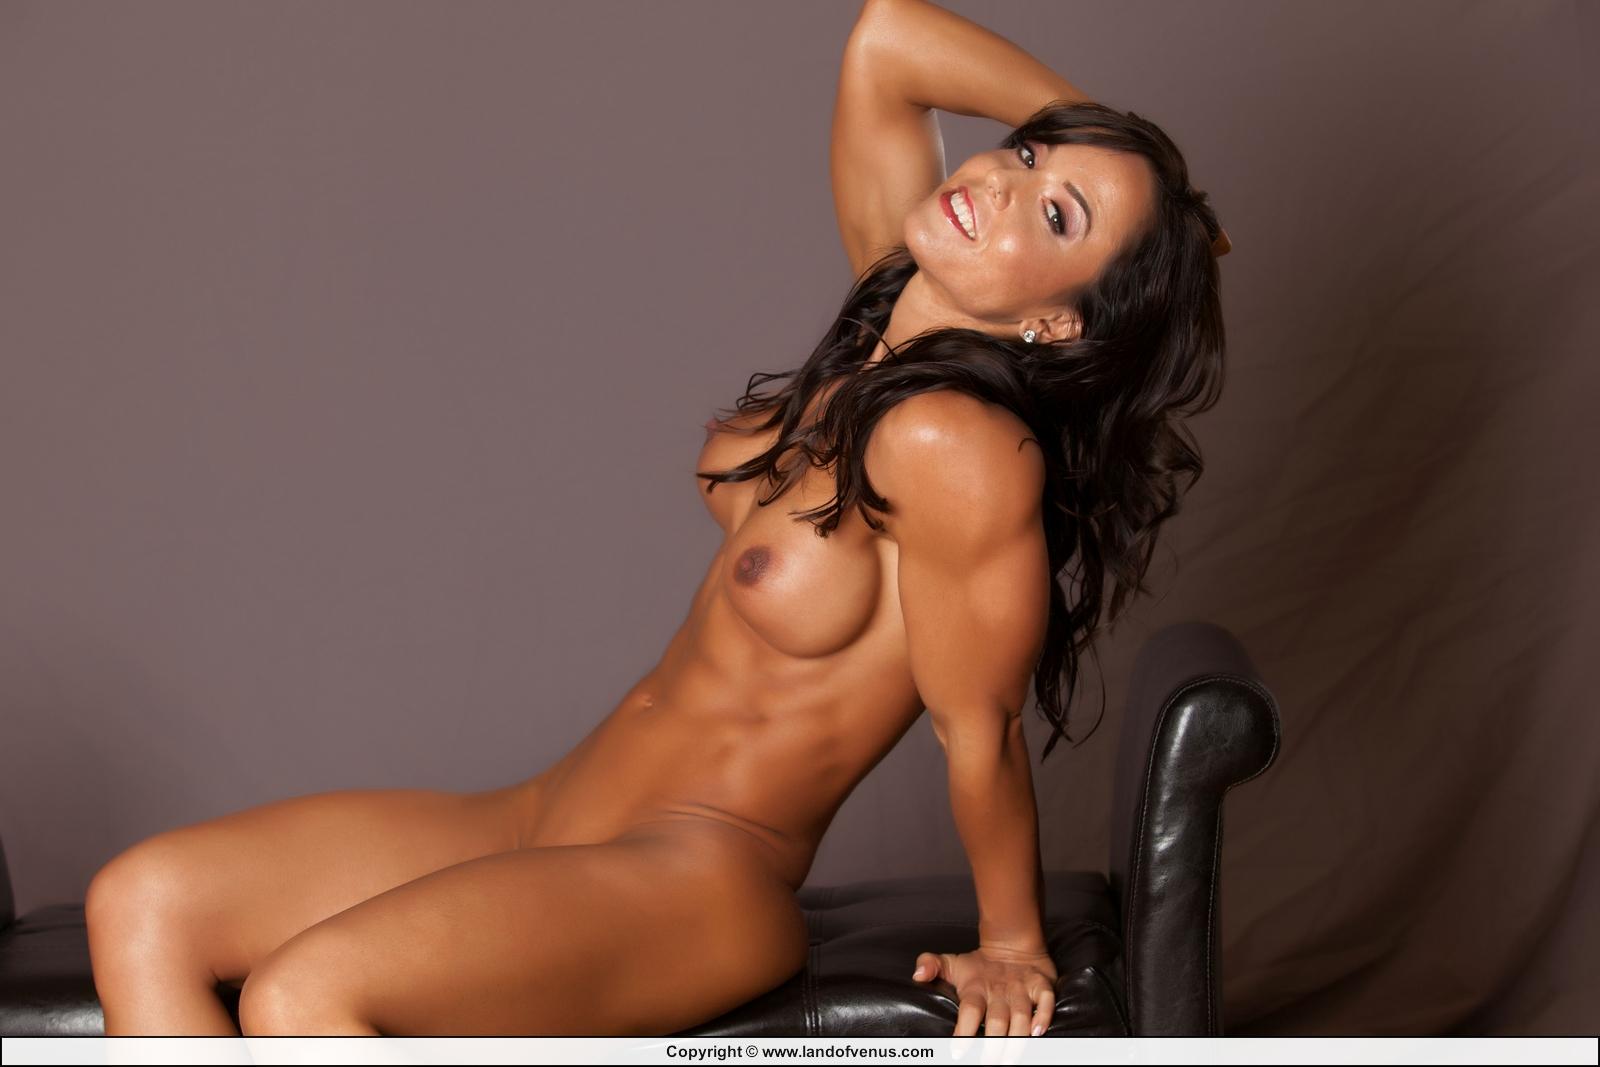 Boobs Female Porn Nude Pic Pic